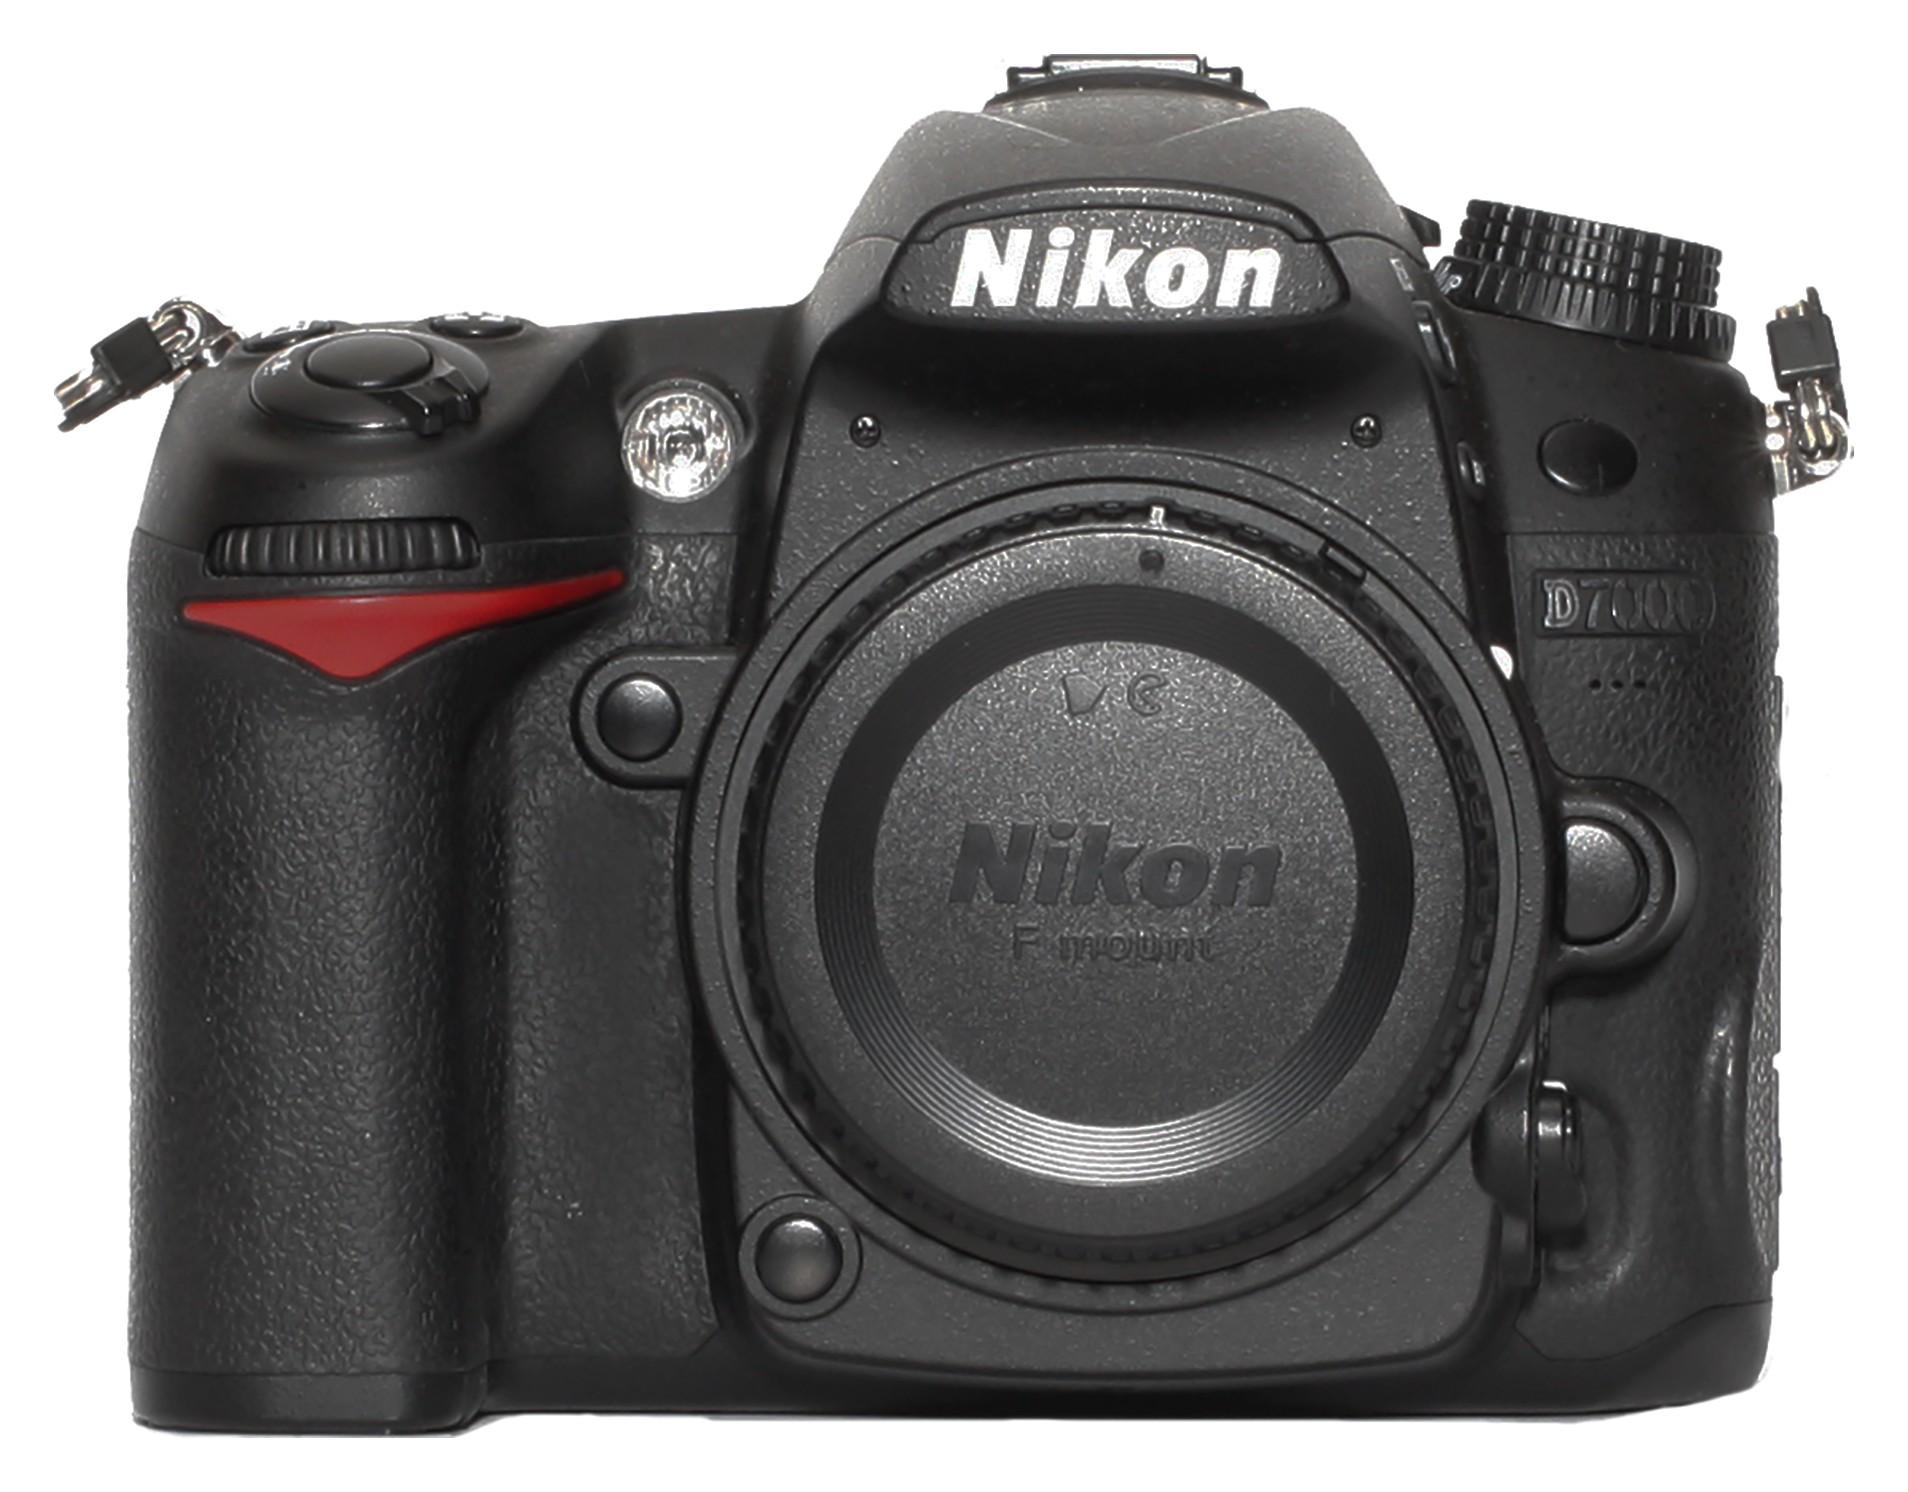 Used Nikon D7000 body